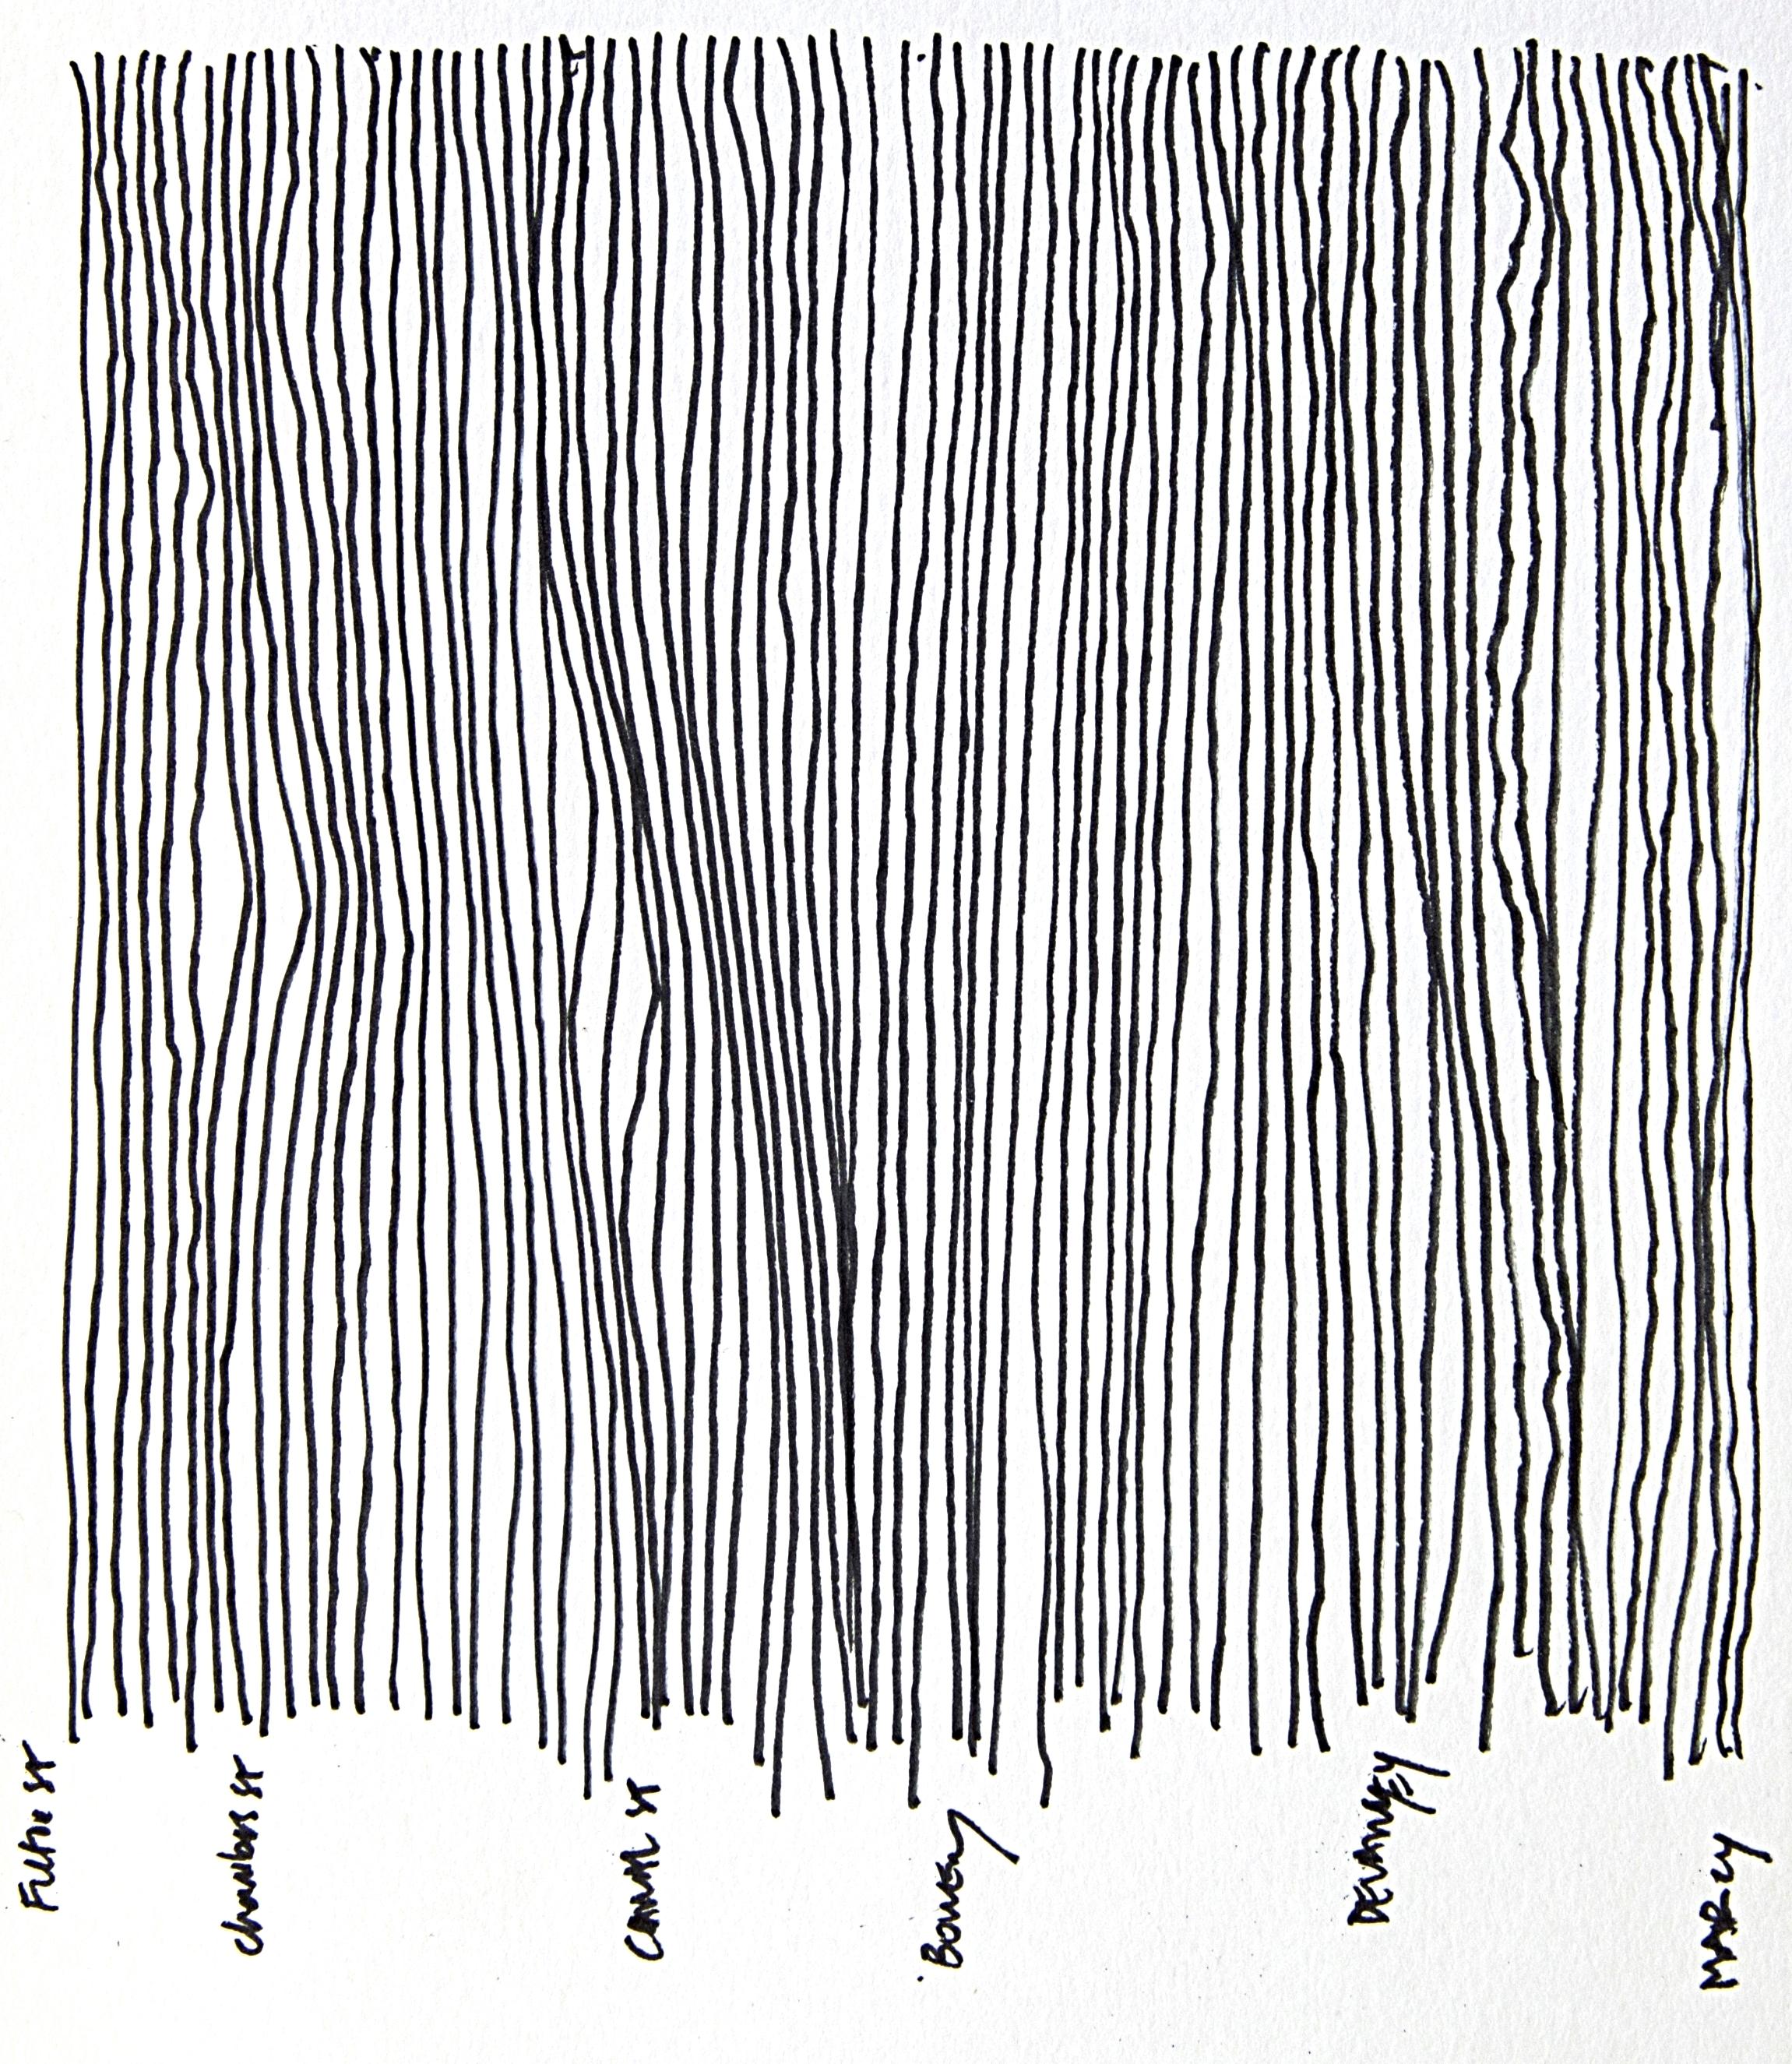 "J Train (Fulton St to Marcy Av)  Ink on paper, 5"" x 8"", 2015"